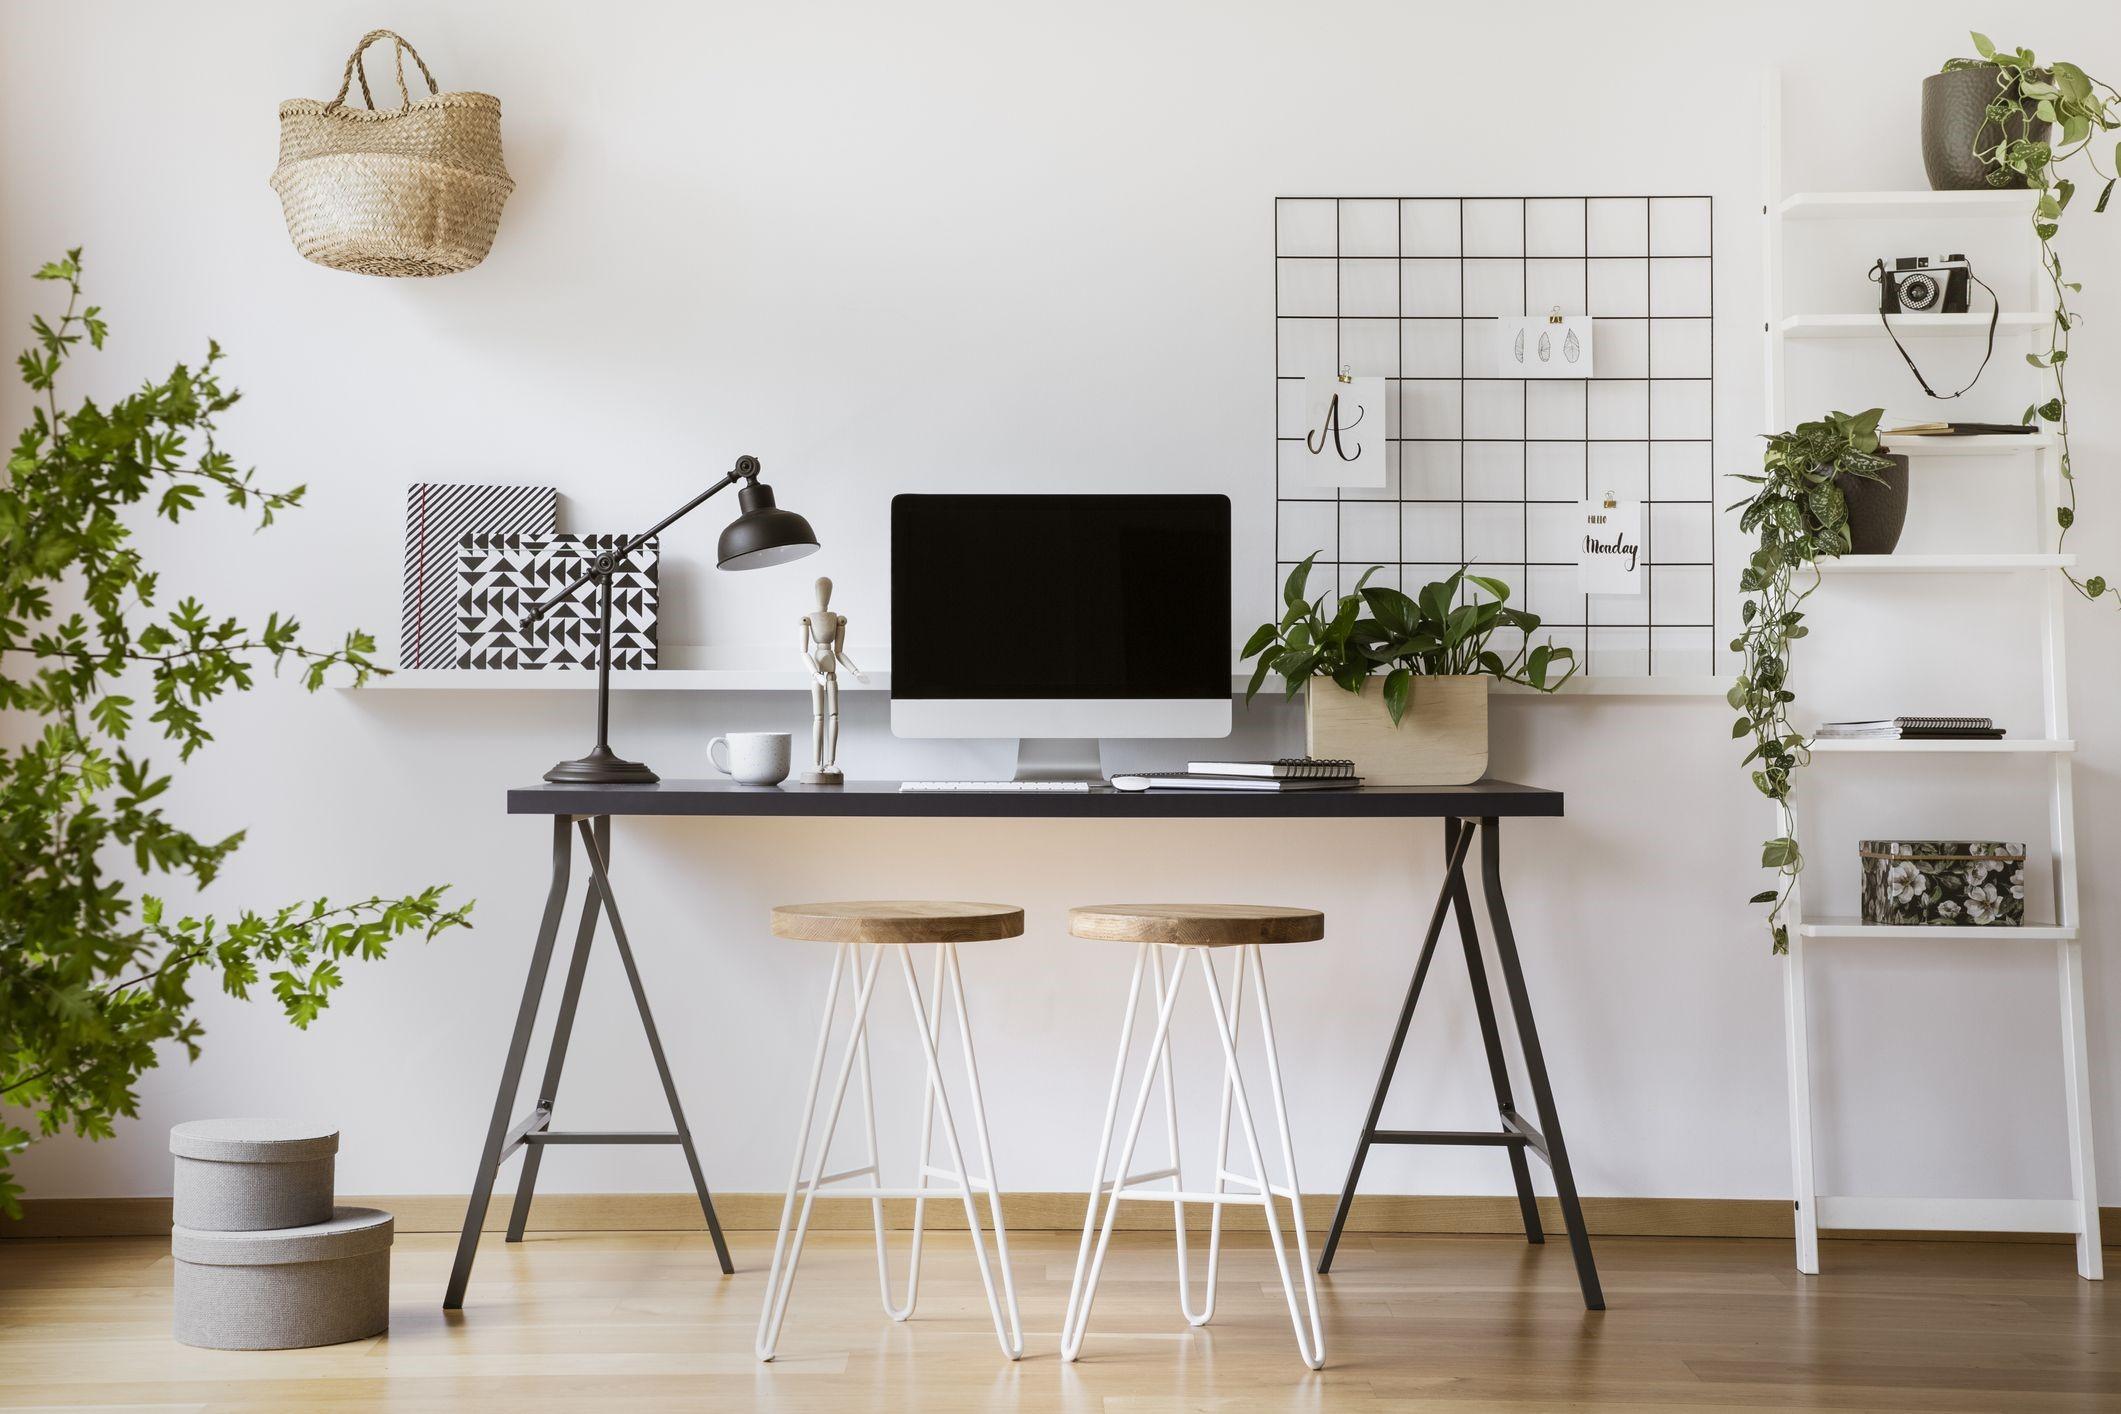 DIY Home Office Organization Tips